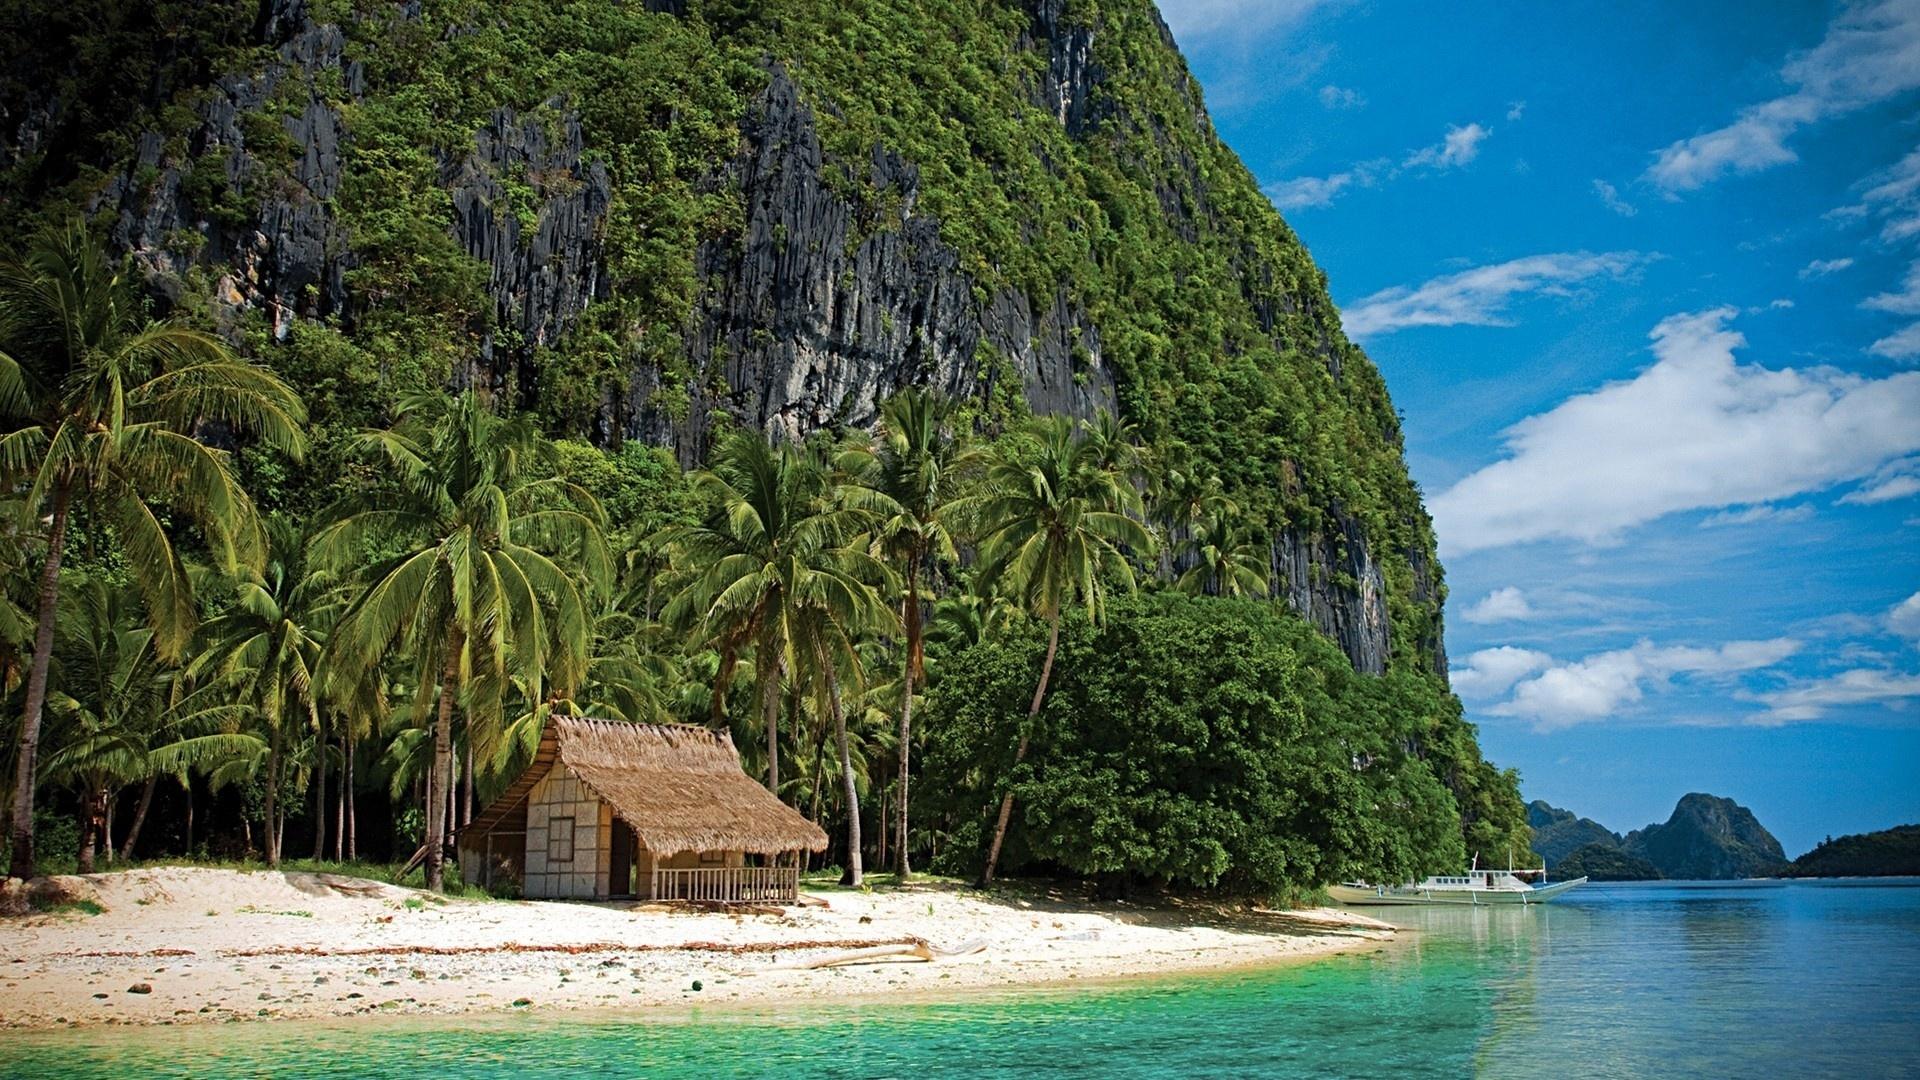 Фото романец на острове сколько подобных